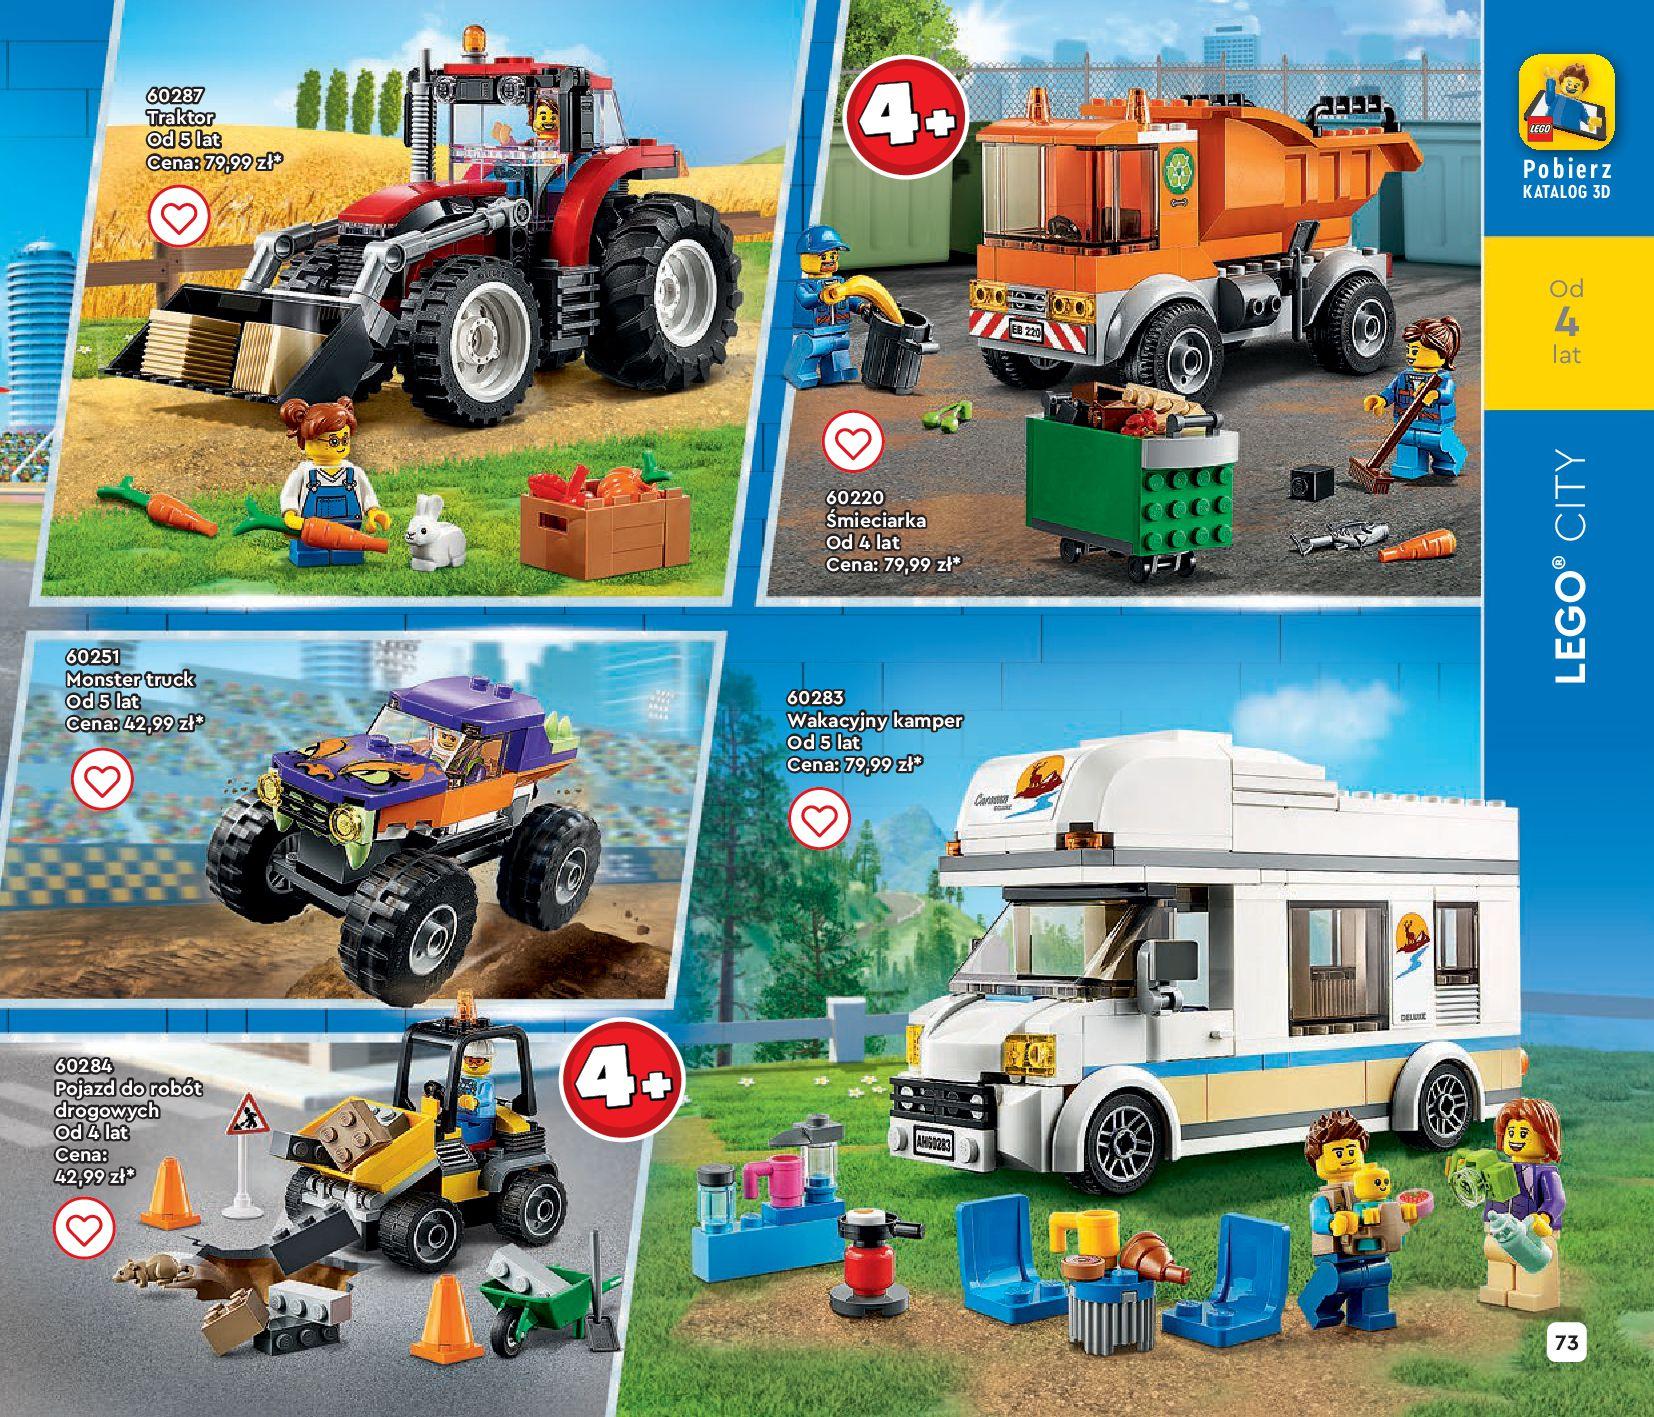 Gazetka LEGO: Gazetka LEGO - katalog 2021-06-30 page-73